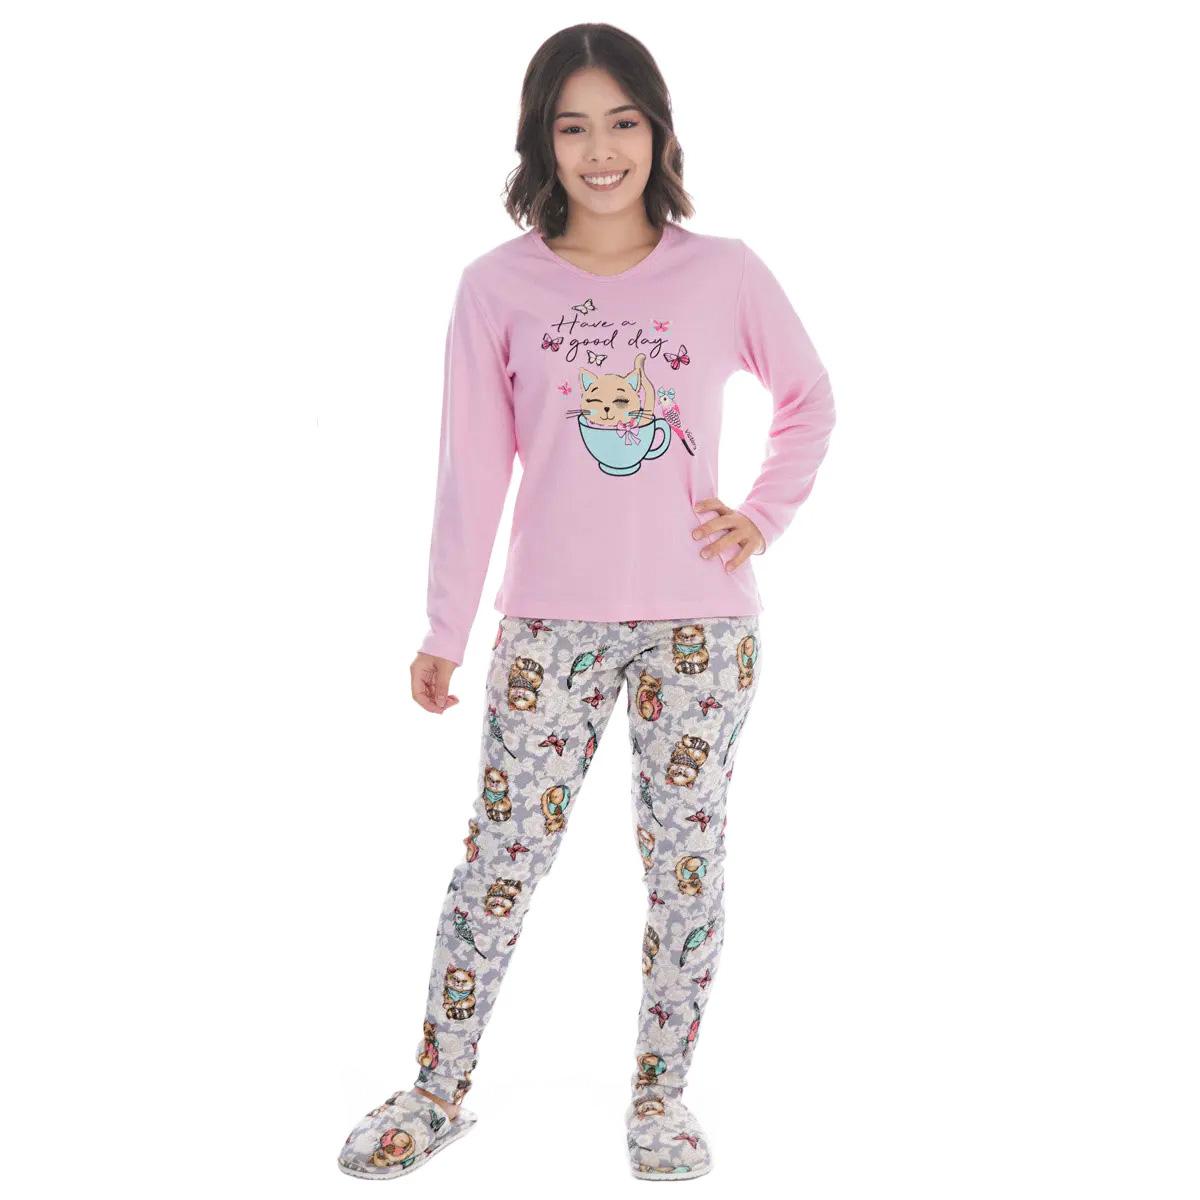 Pijama de inverno juvenil para menina SWEET Victory